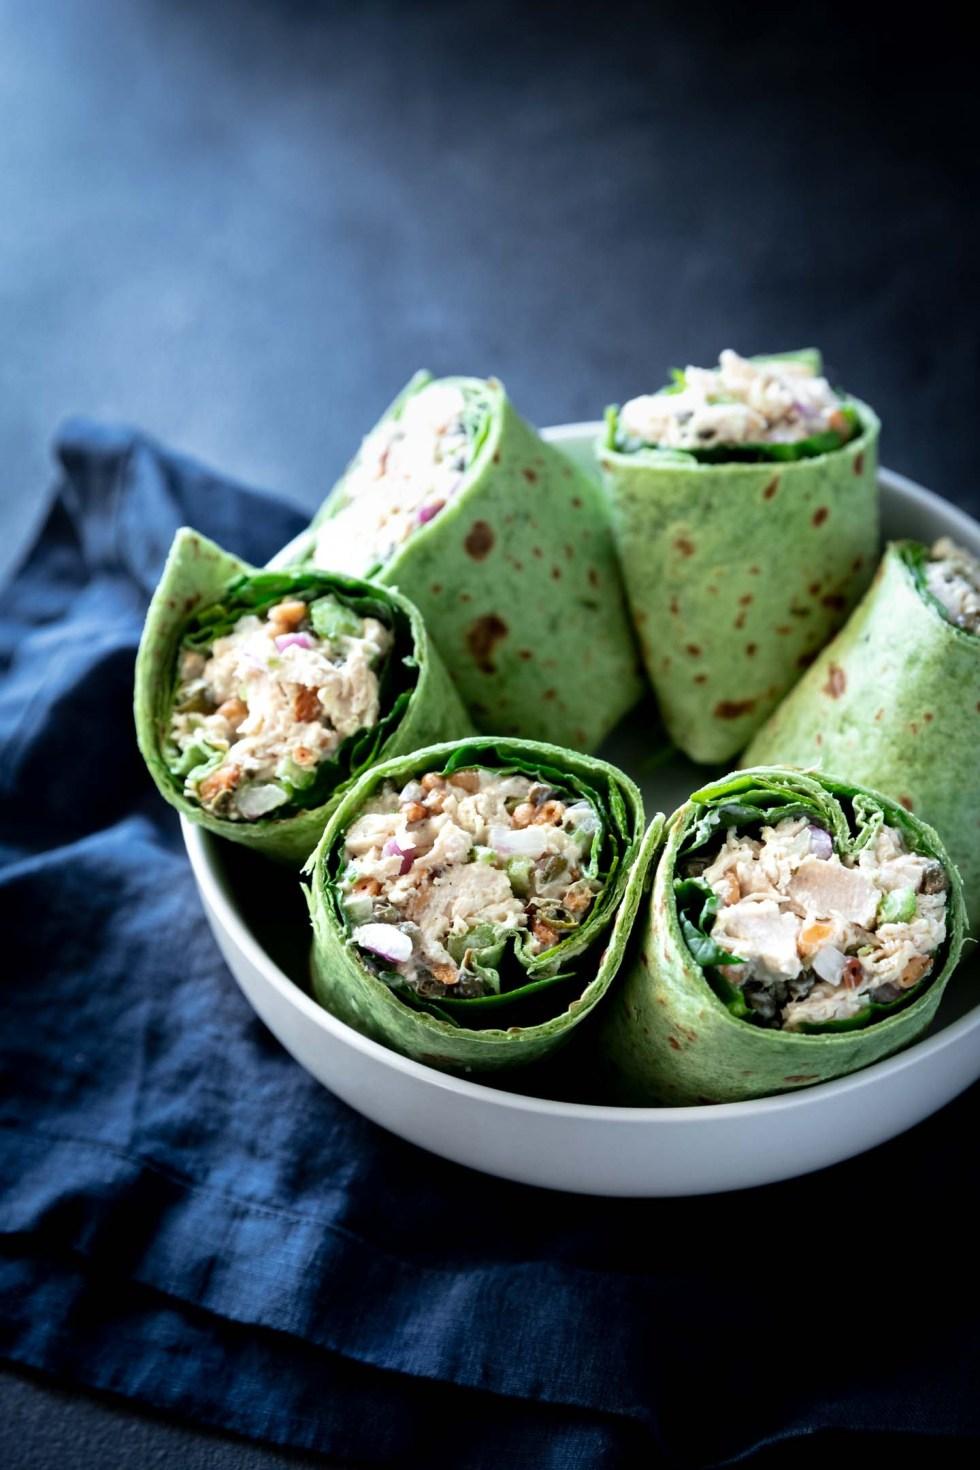 Chicken salad wraps in green spinach wraps